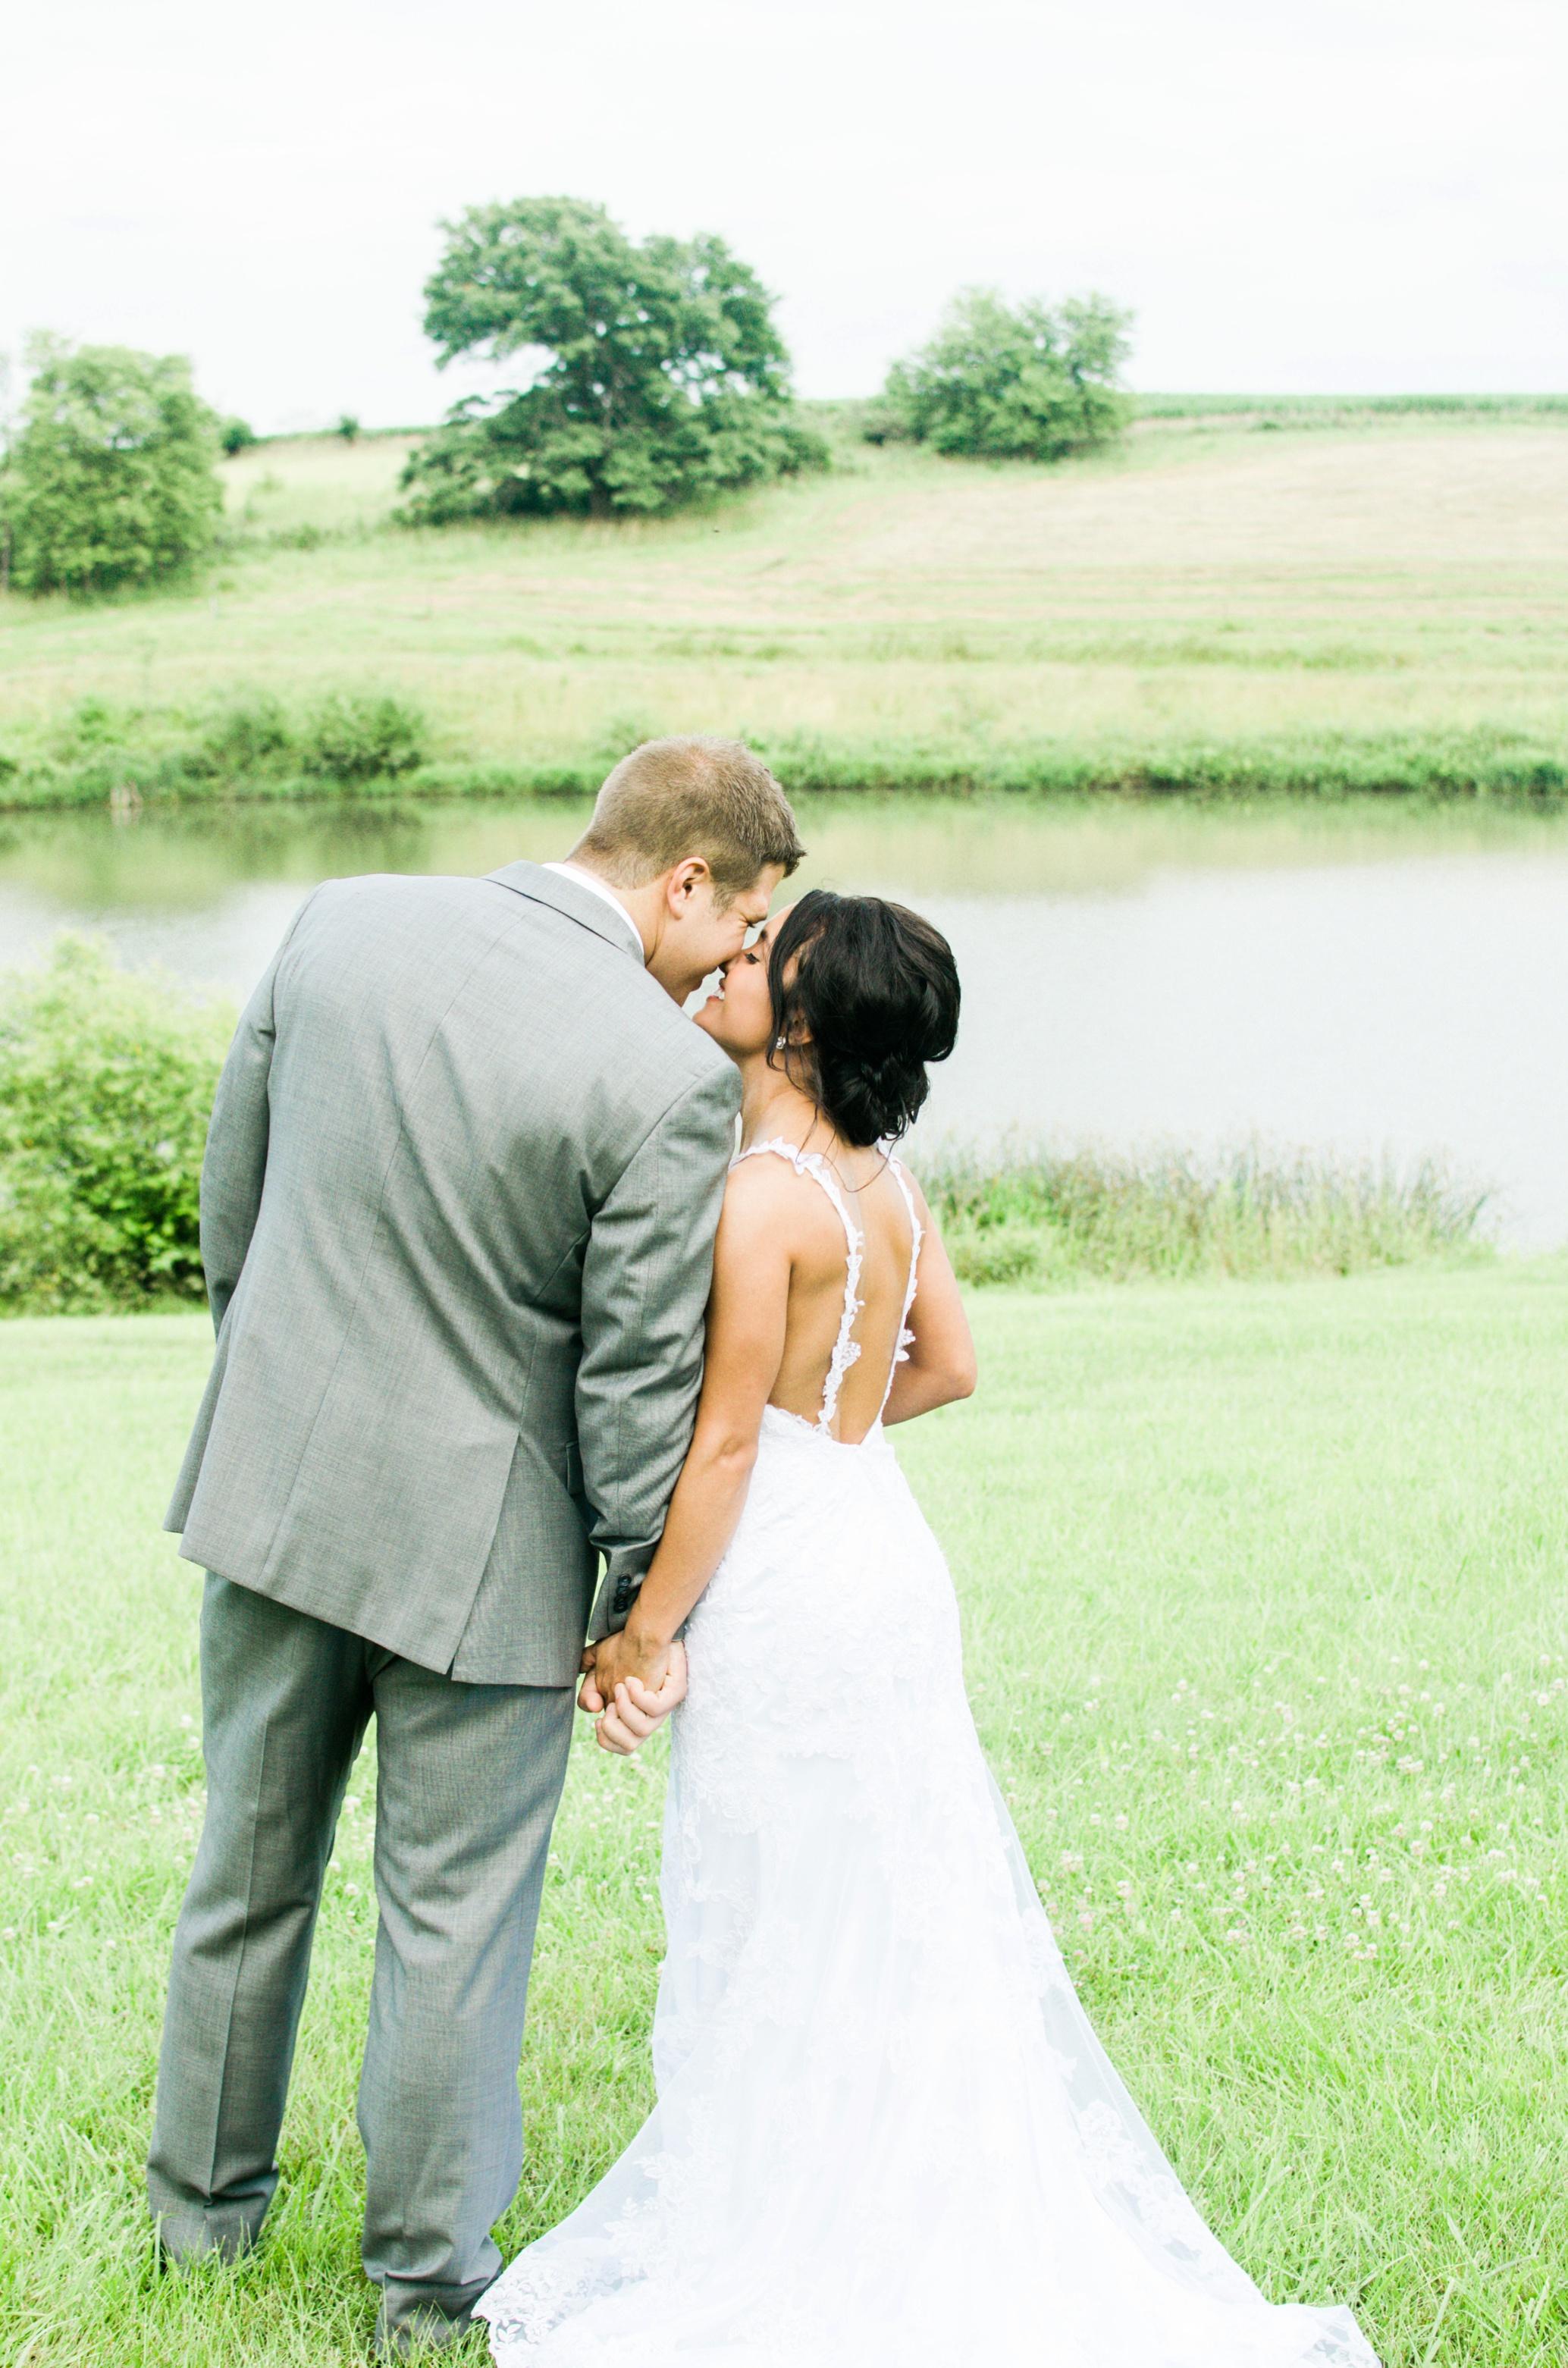 Barnes' Place Rustic Outdoor Wedding | Ali Leigh Photo Minneapolis Wedding Photographer_0199.jpg